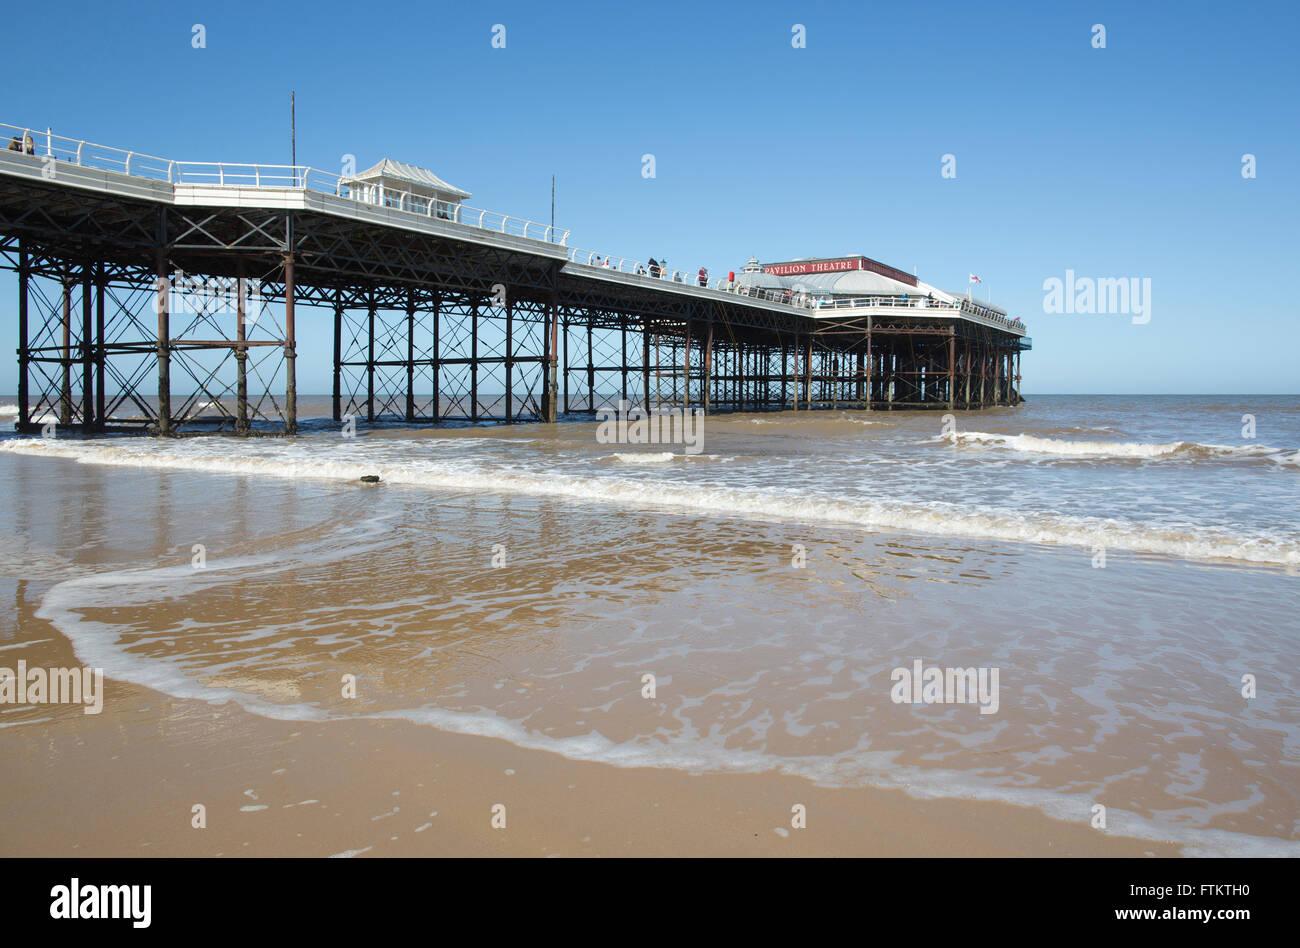 Cromer Pier, Norfolk coastline, England, United Kingdom Stock Photo